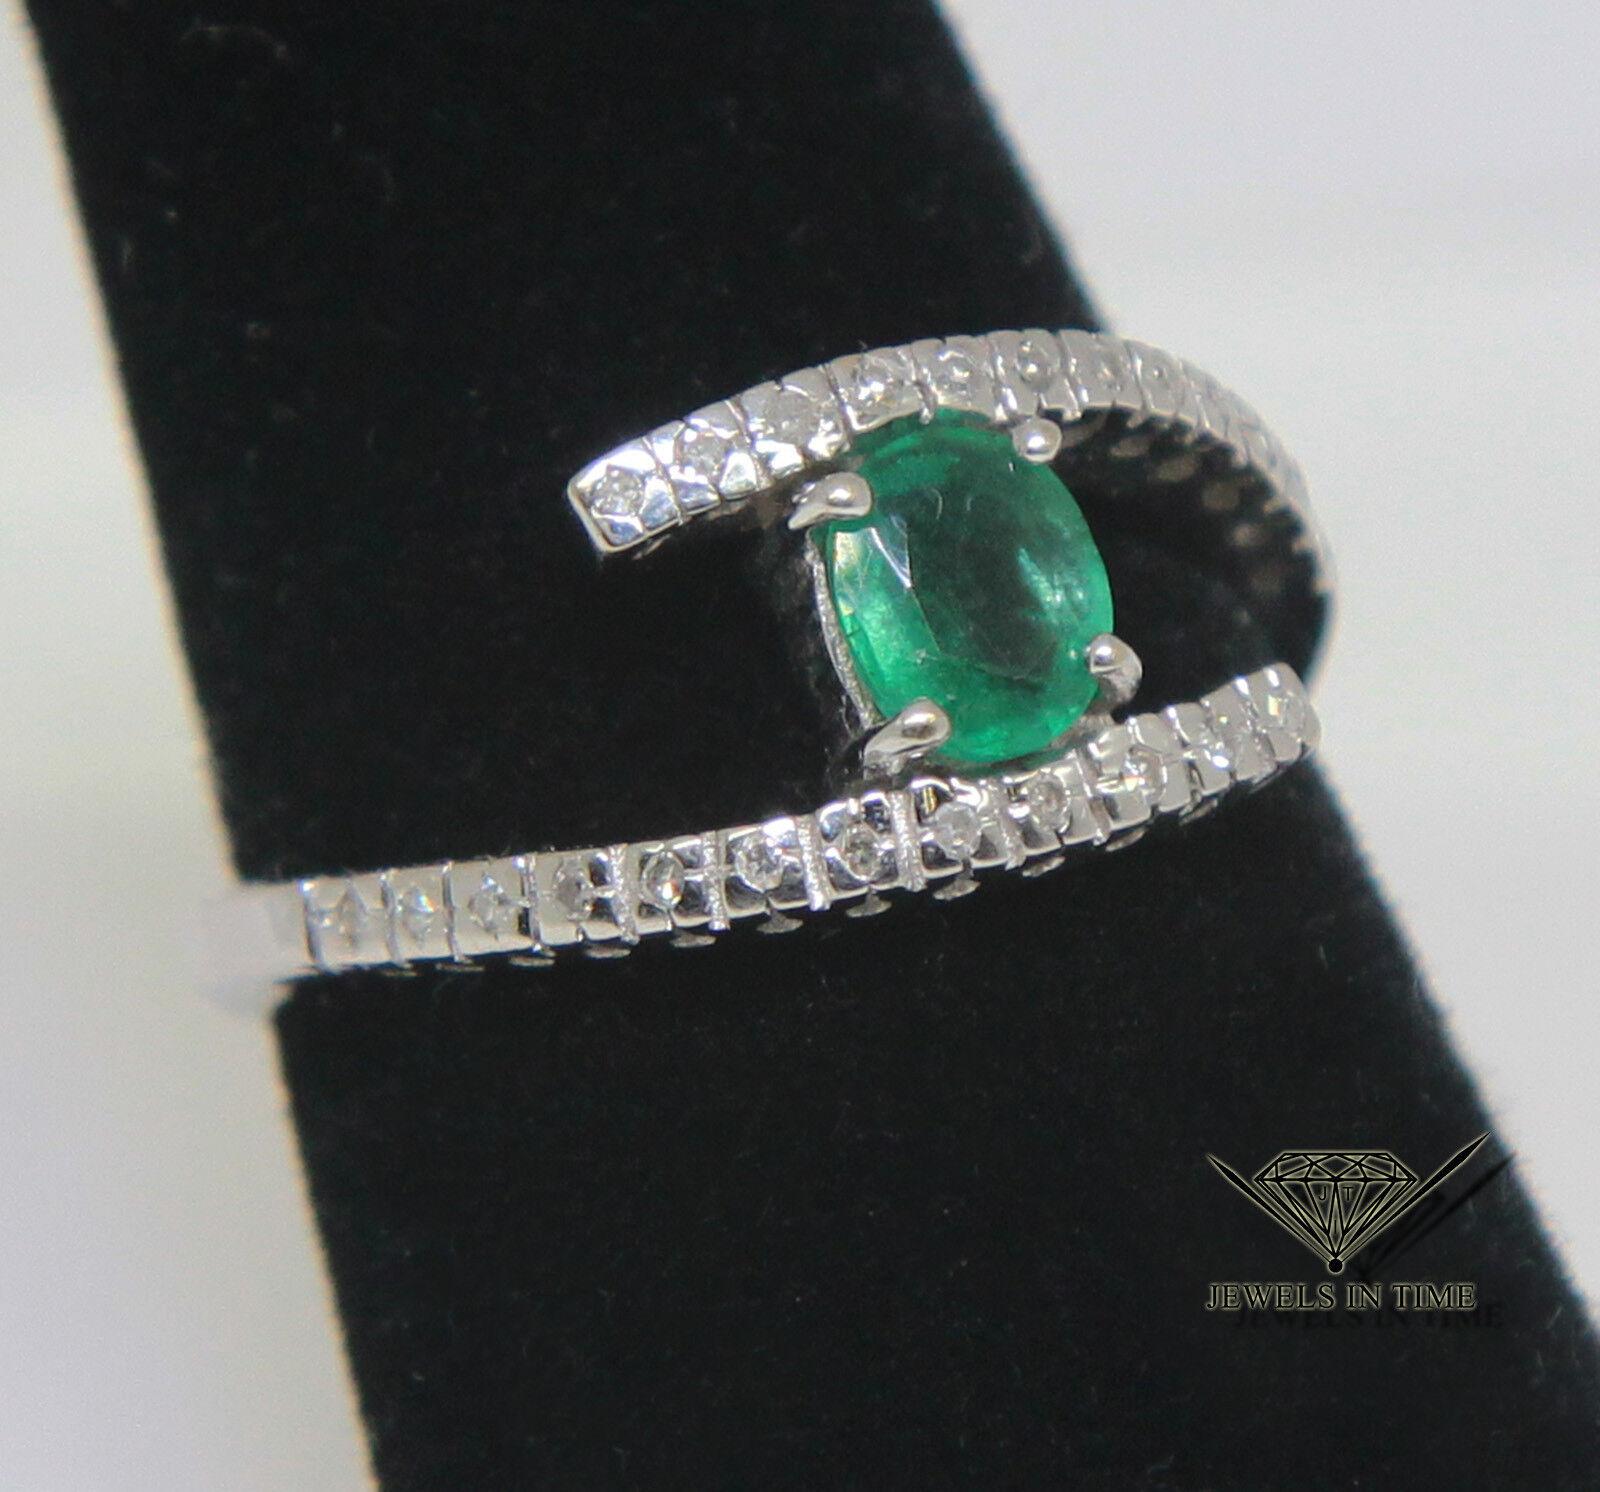 0.10 Carat Diamond & 0.30 Ct Emerald 18k White gold Ring Size 6.75